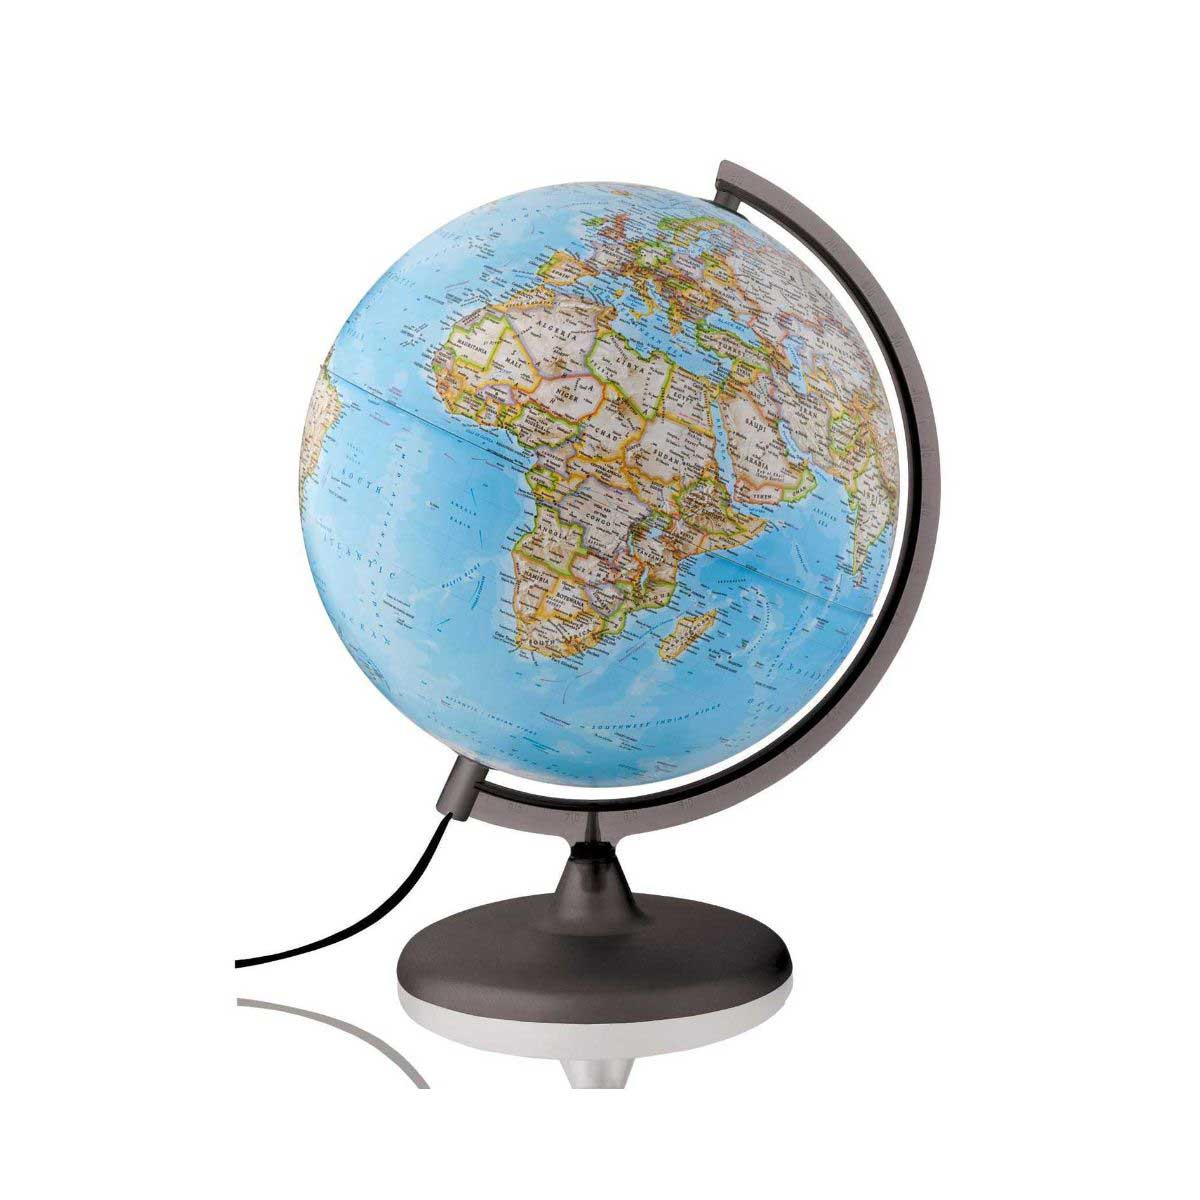 National Geographic Classic Illuminated Globe 25cm, Reference